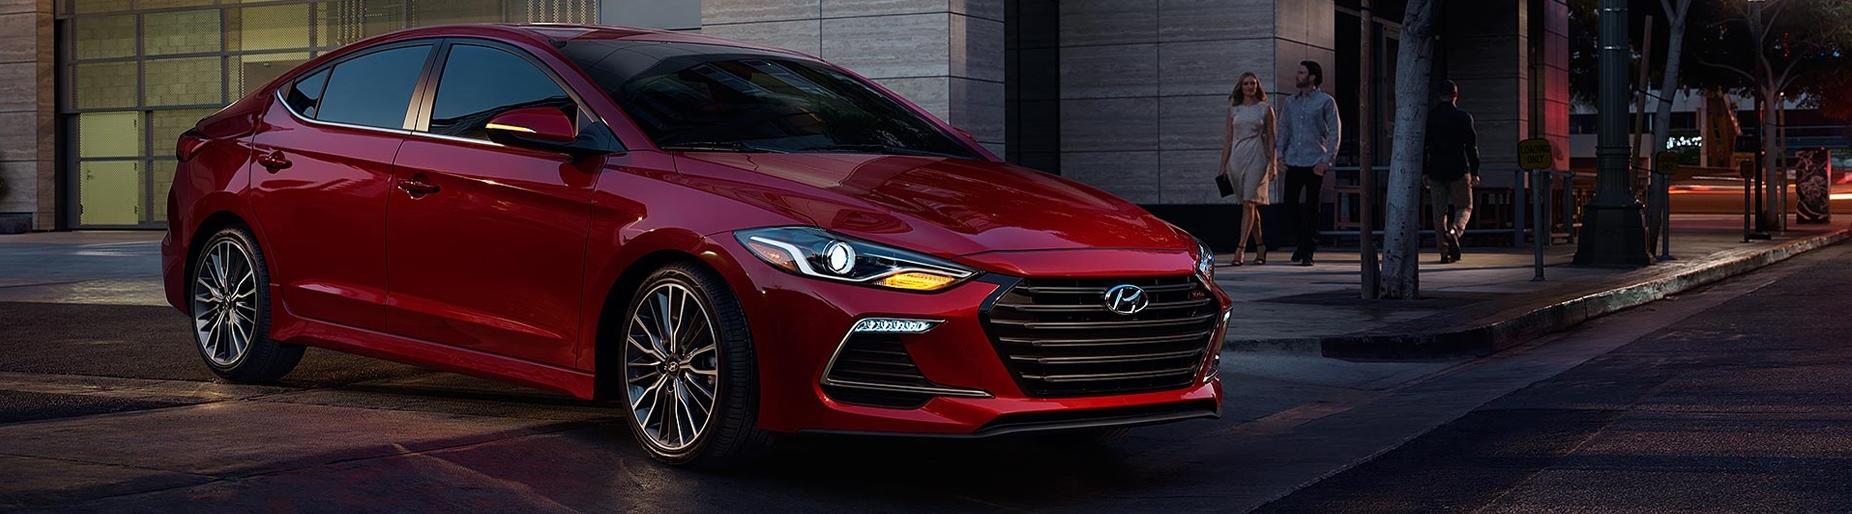 Nice 2018 Hyundai Elantra Sedan Tampa | Hyundai Sedans For Sale Tampa, FL